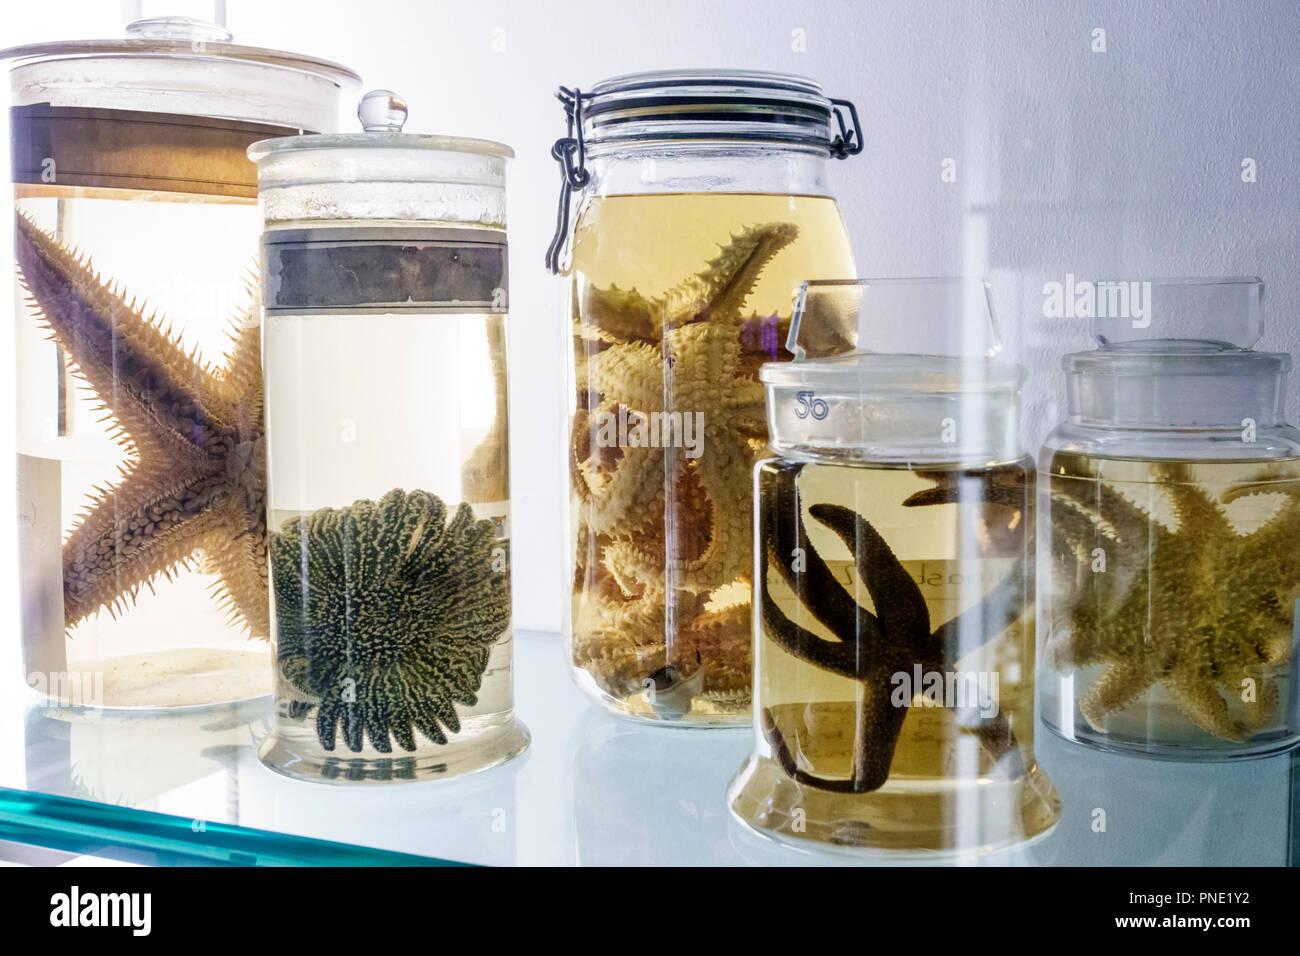 London England Great Britain United Kingdom Kensington Natural History Museum inside echinoderms specimen jars marine invertebrates starfish - Stock Image